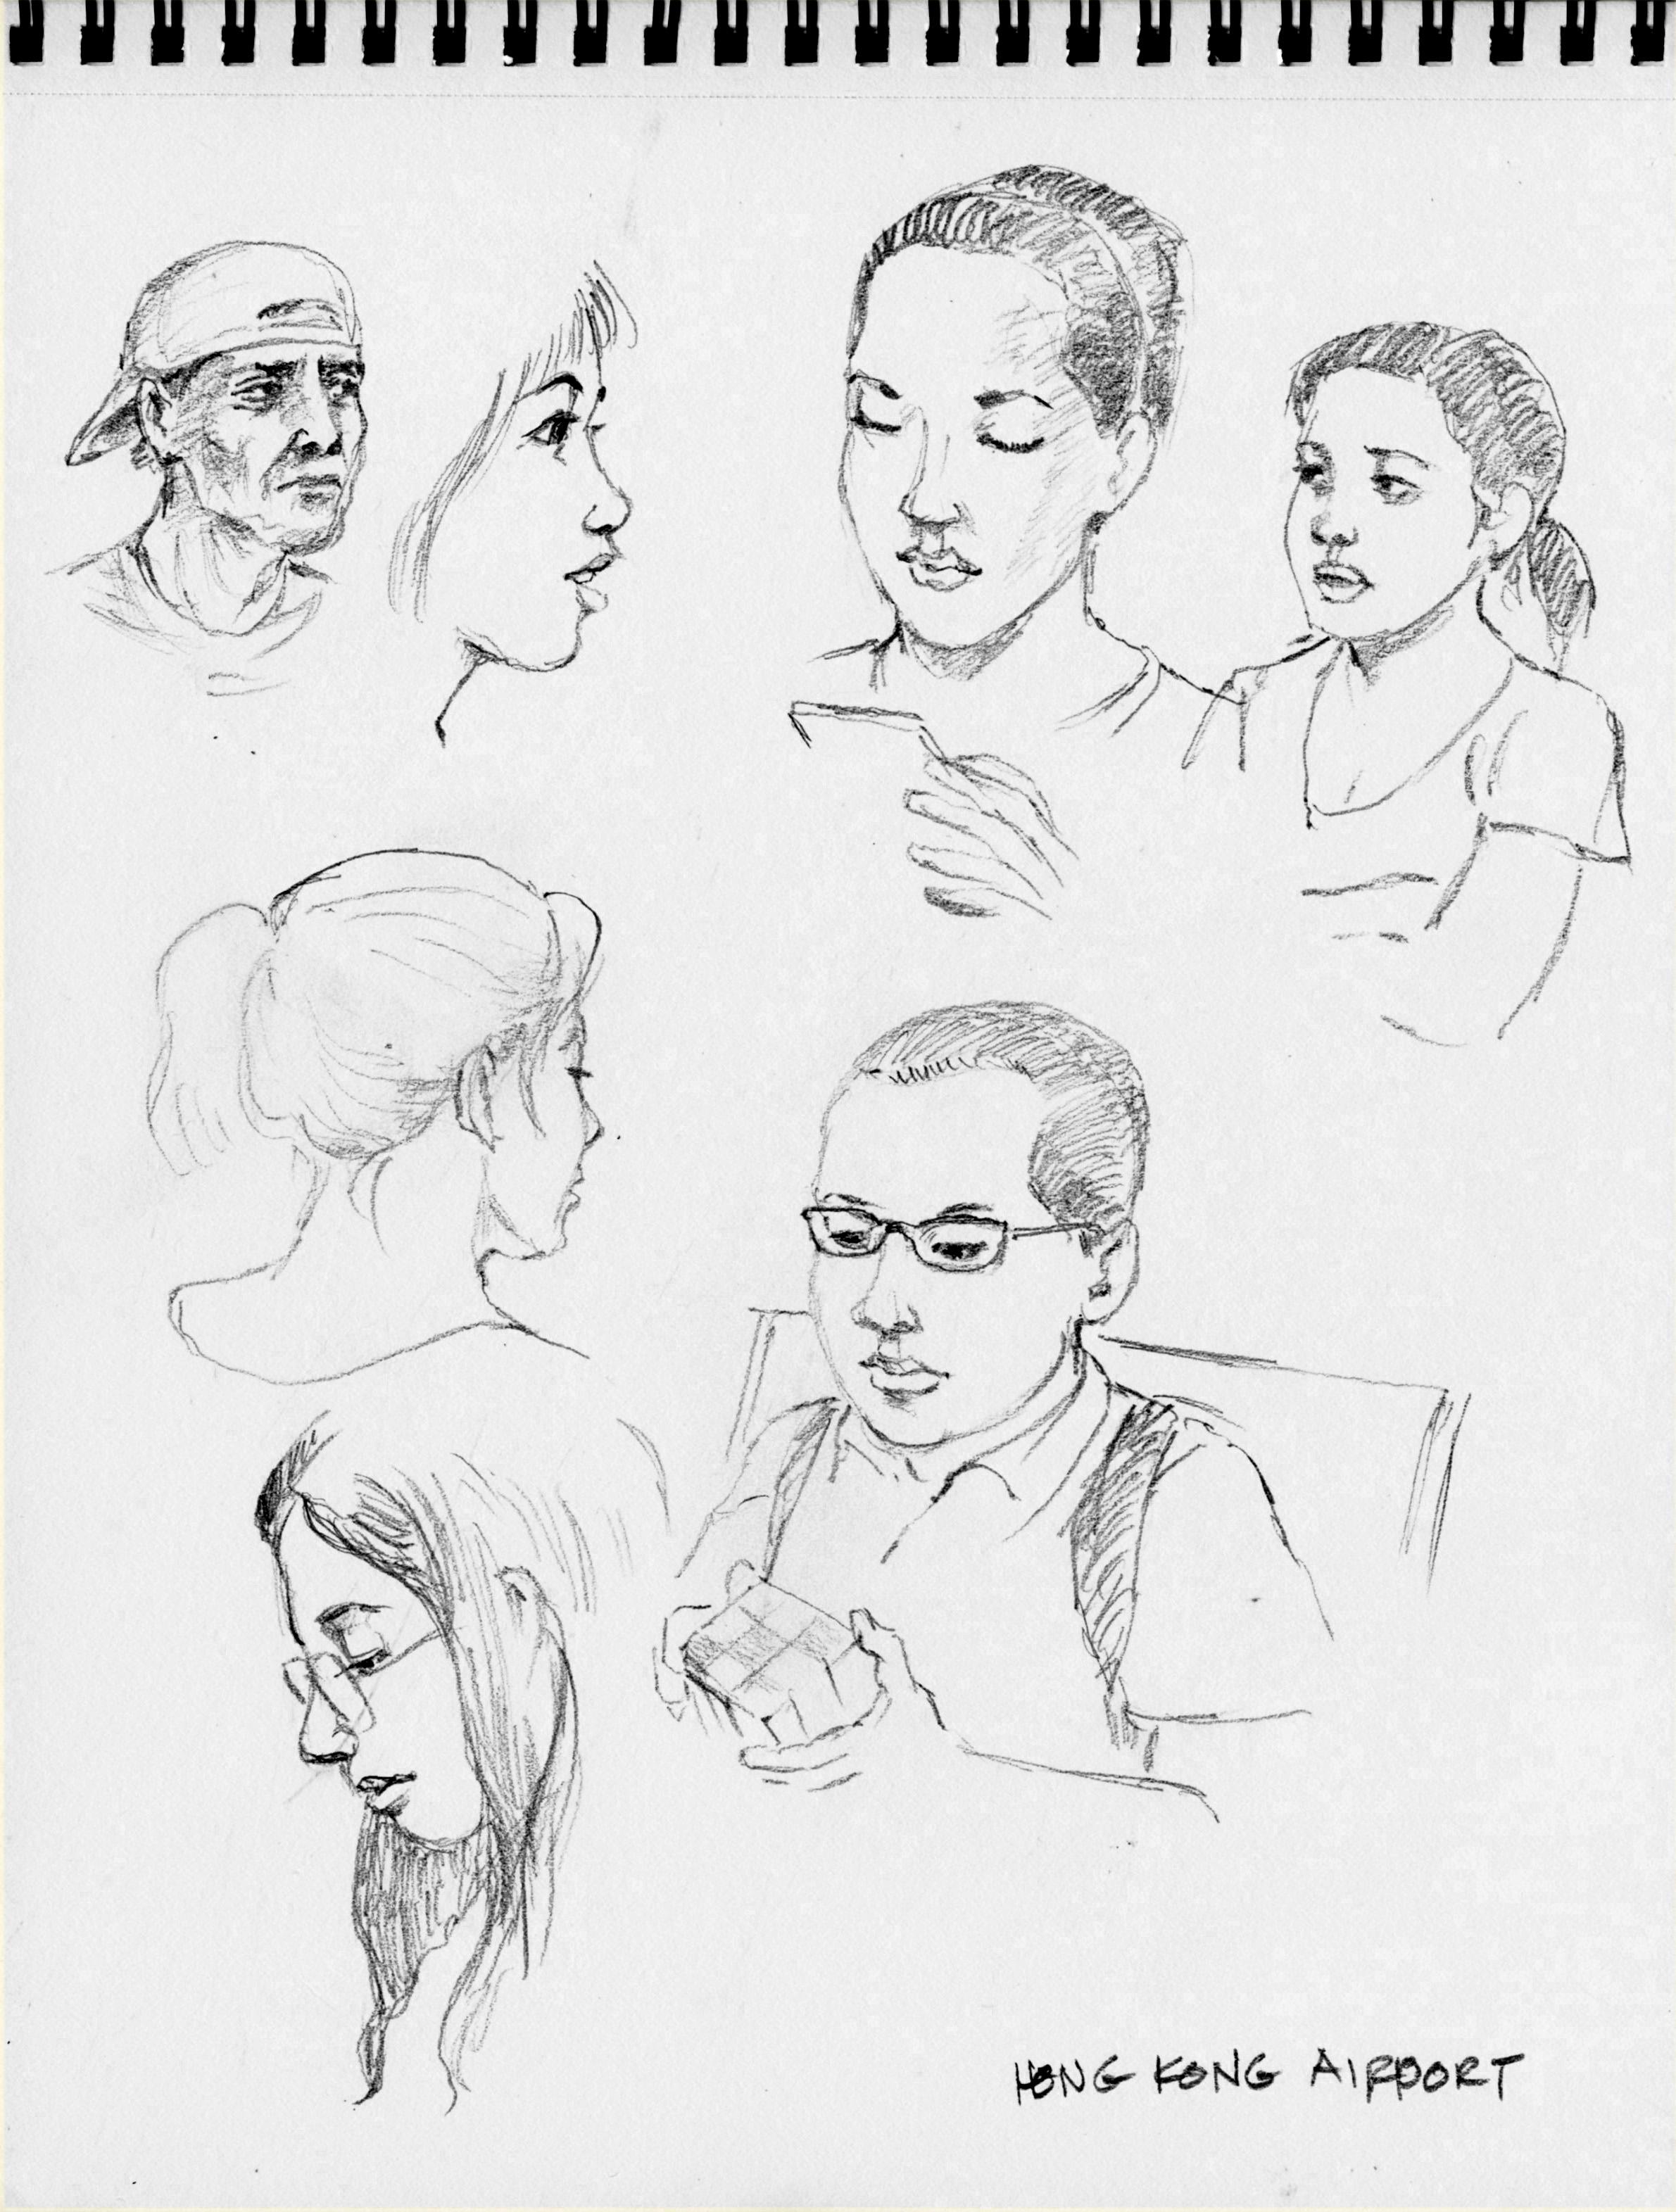 July 2014 sketch440.jpg